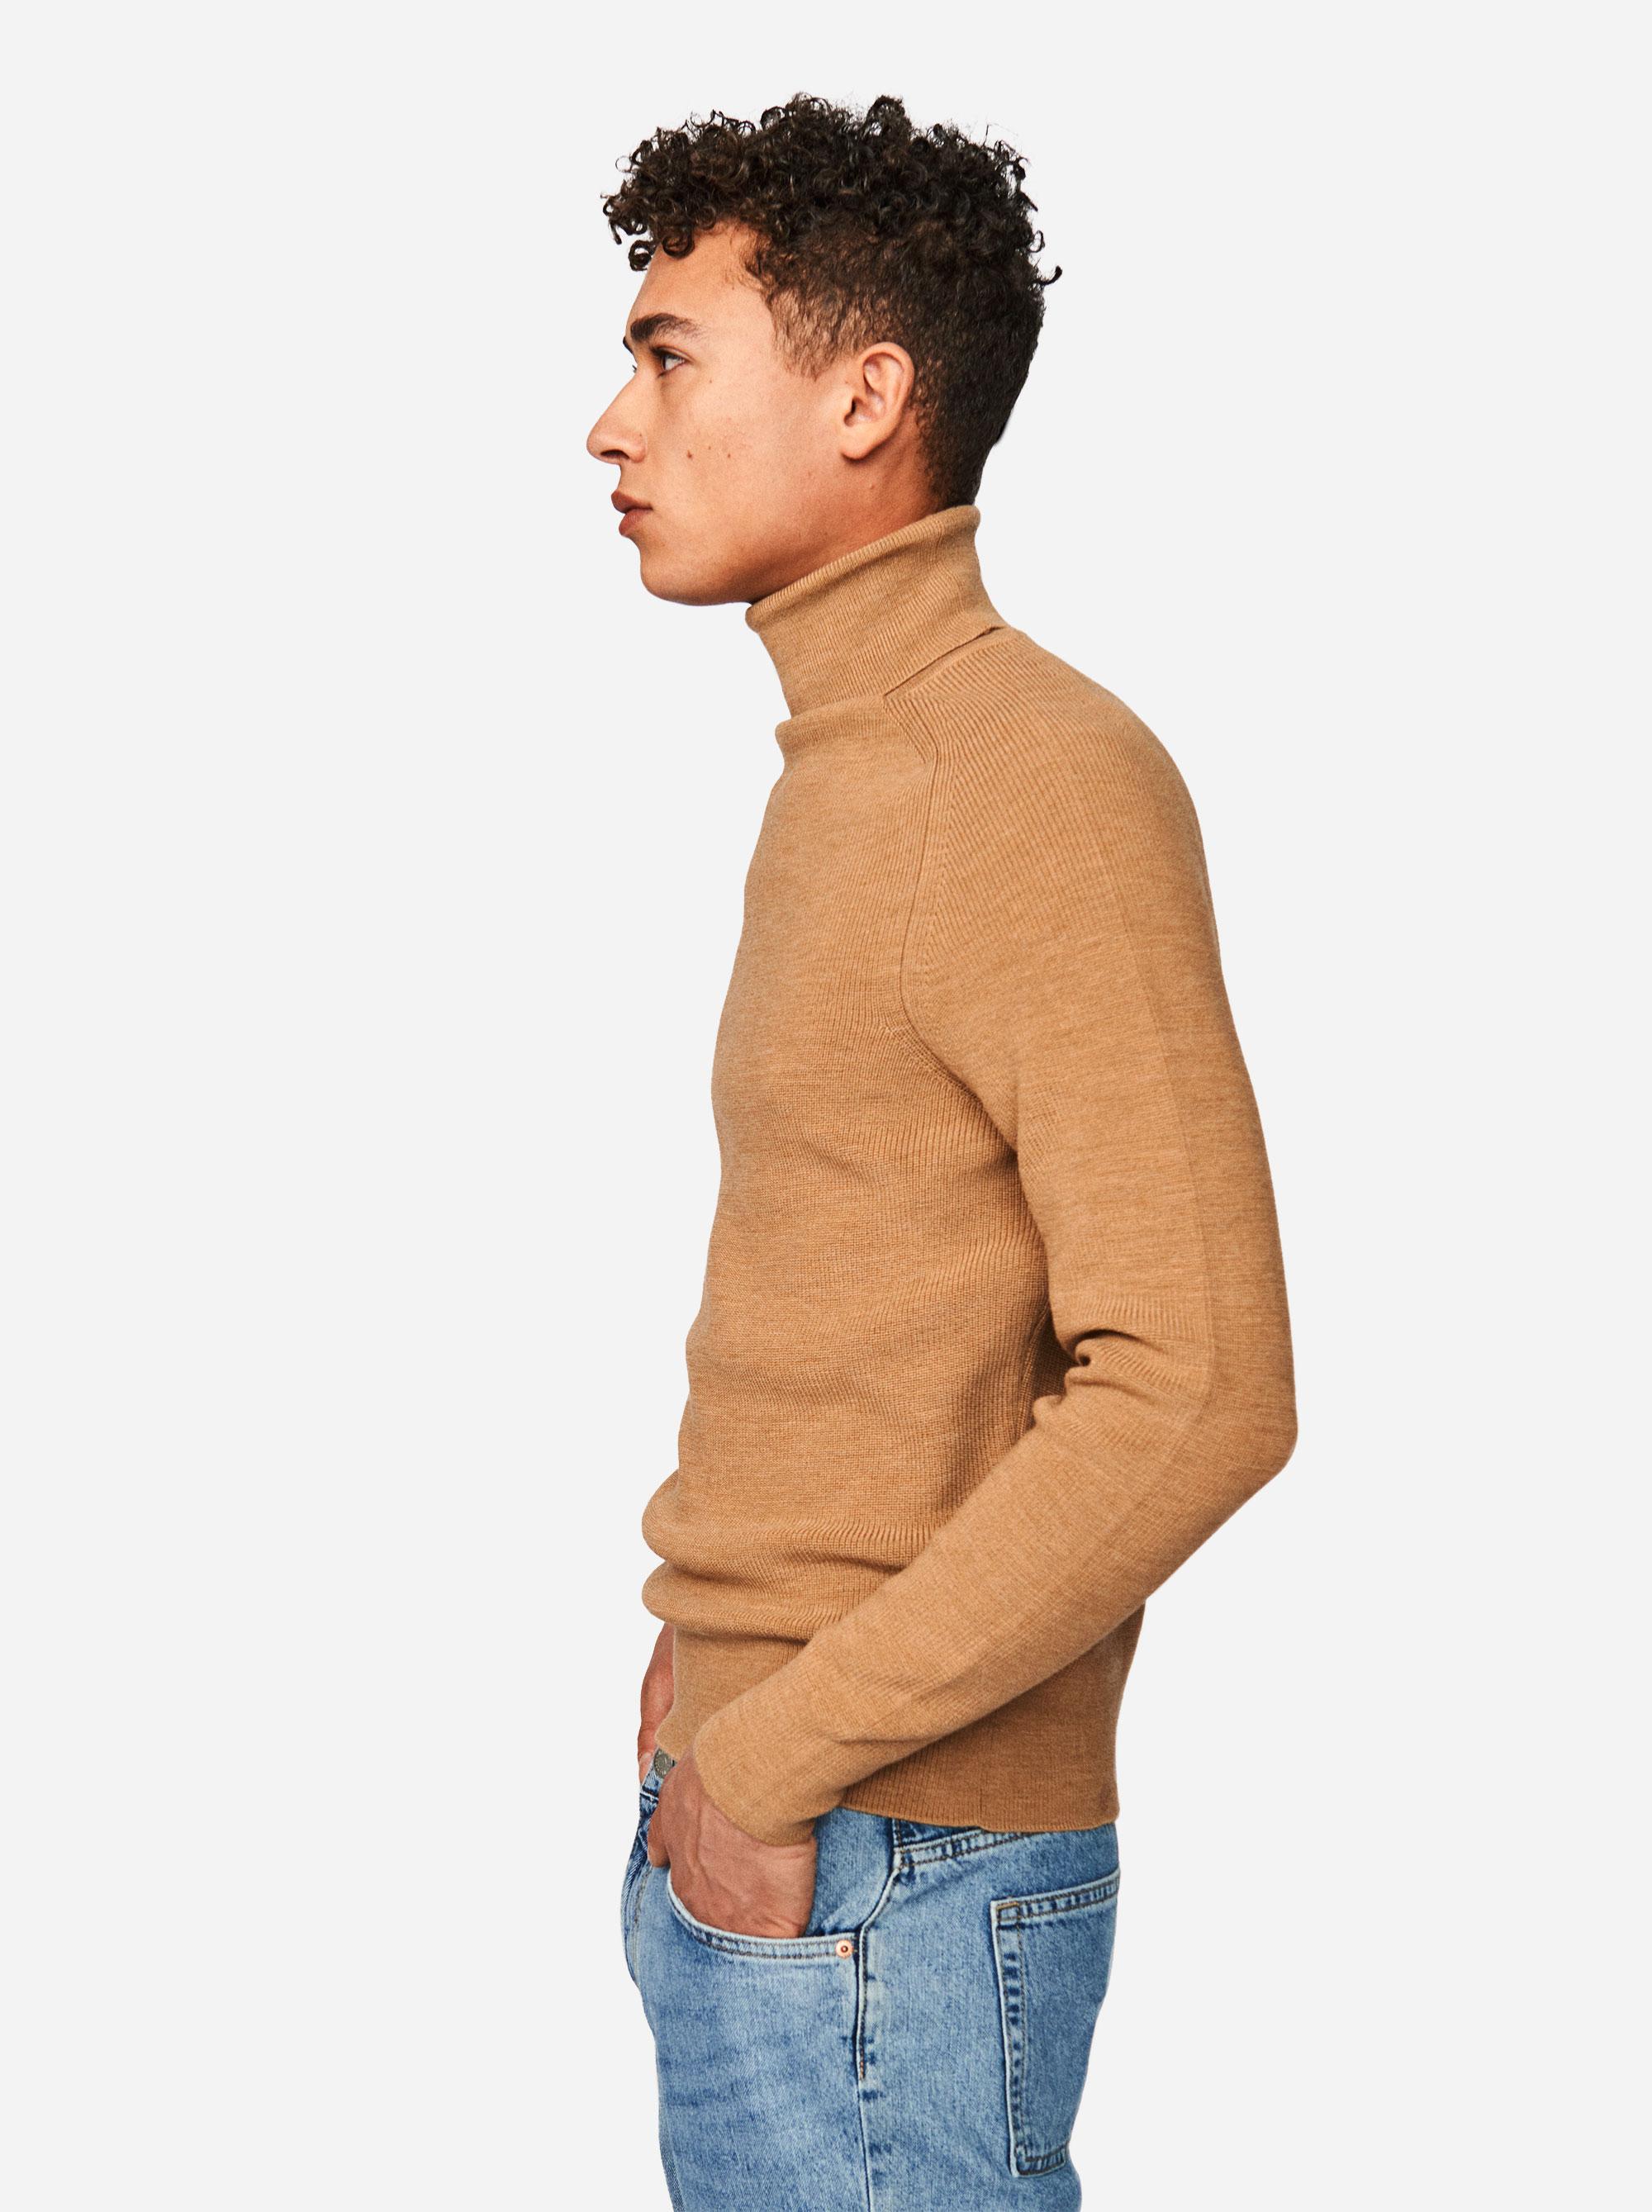 Teym - Turtleneck - The Merino Sweater - Men - Camel - 2